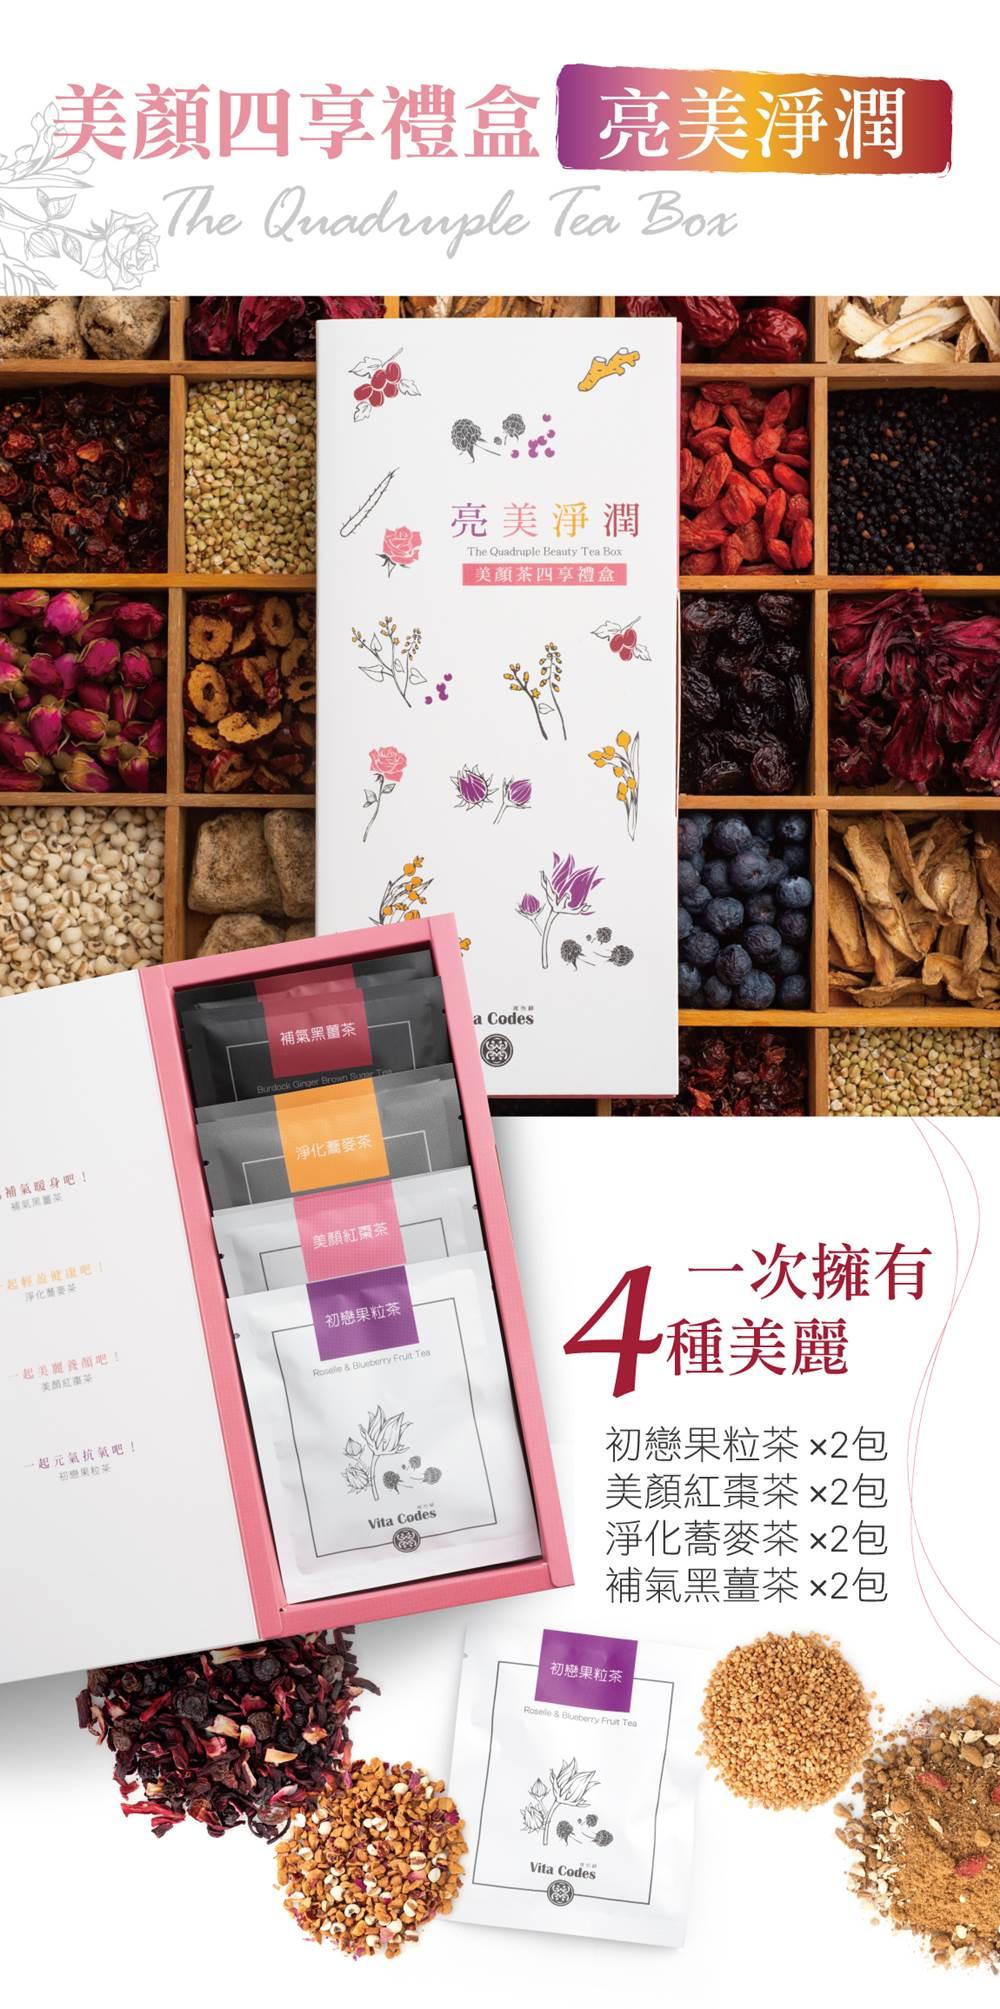 VitaCodes美顏茶-產品介紹09-美顏茶四享禮盒-亮美淨潤